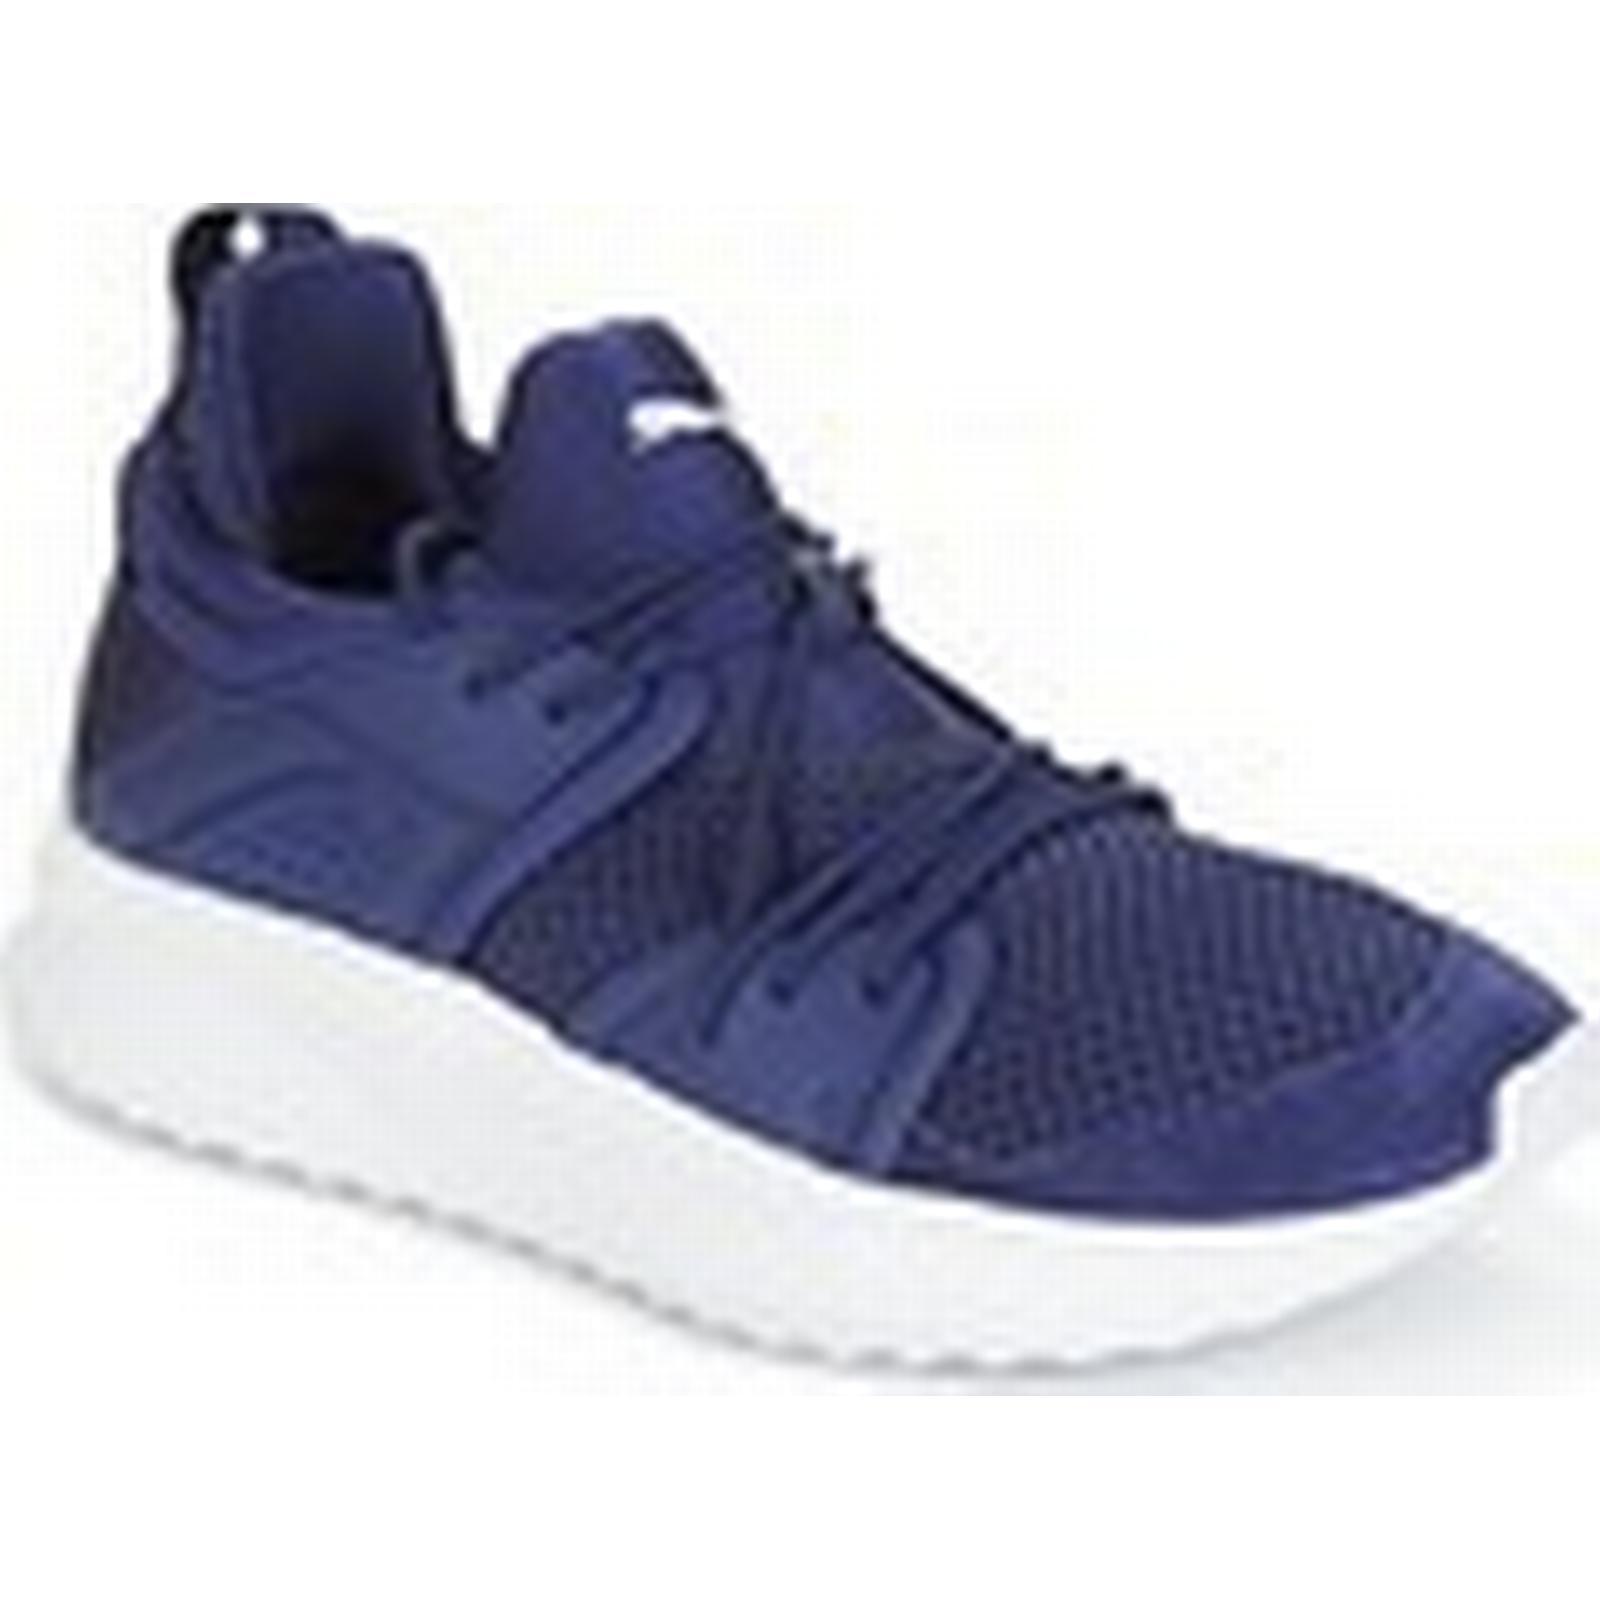 Puma Blue  Tsugi Blaze  men's Shoes (Trainers) in Blue Puma ae6b47